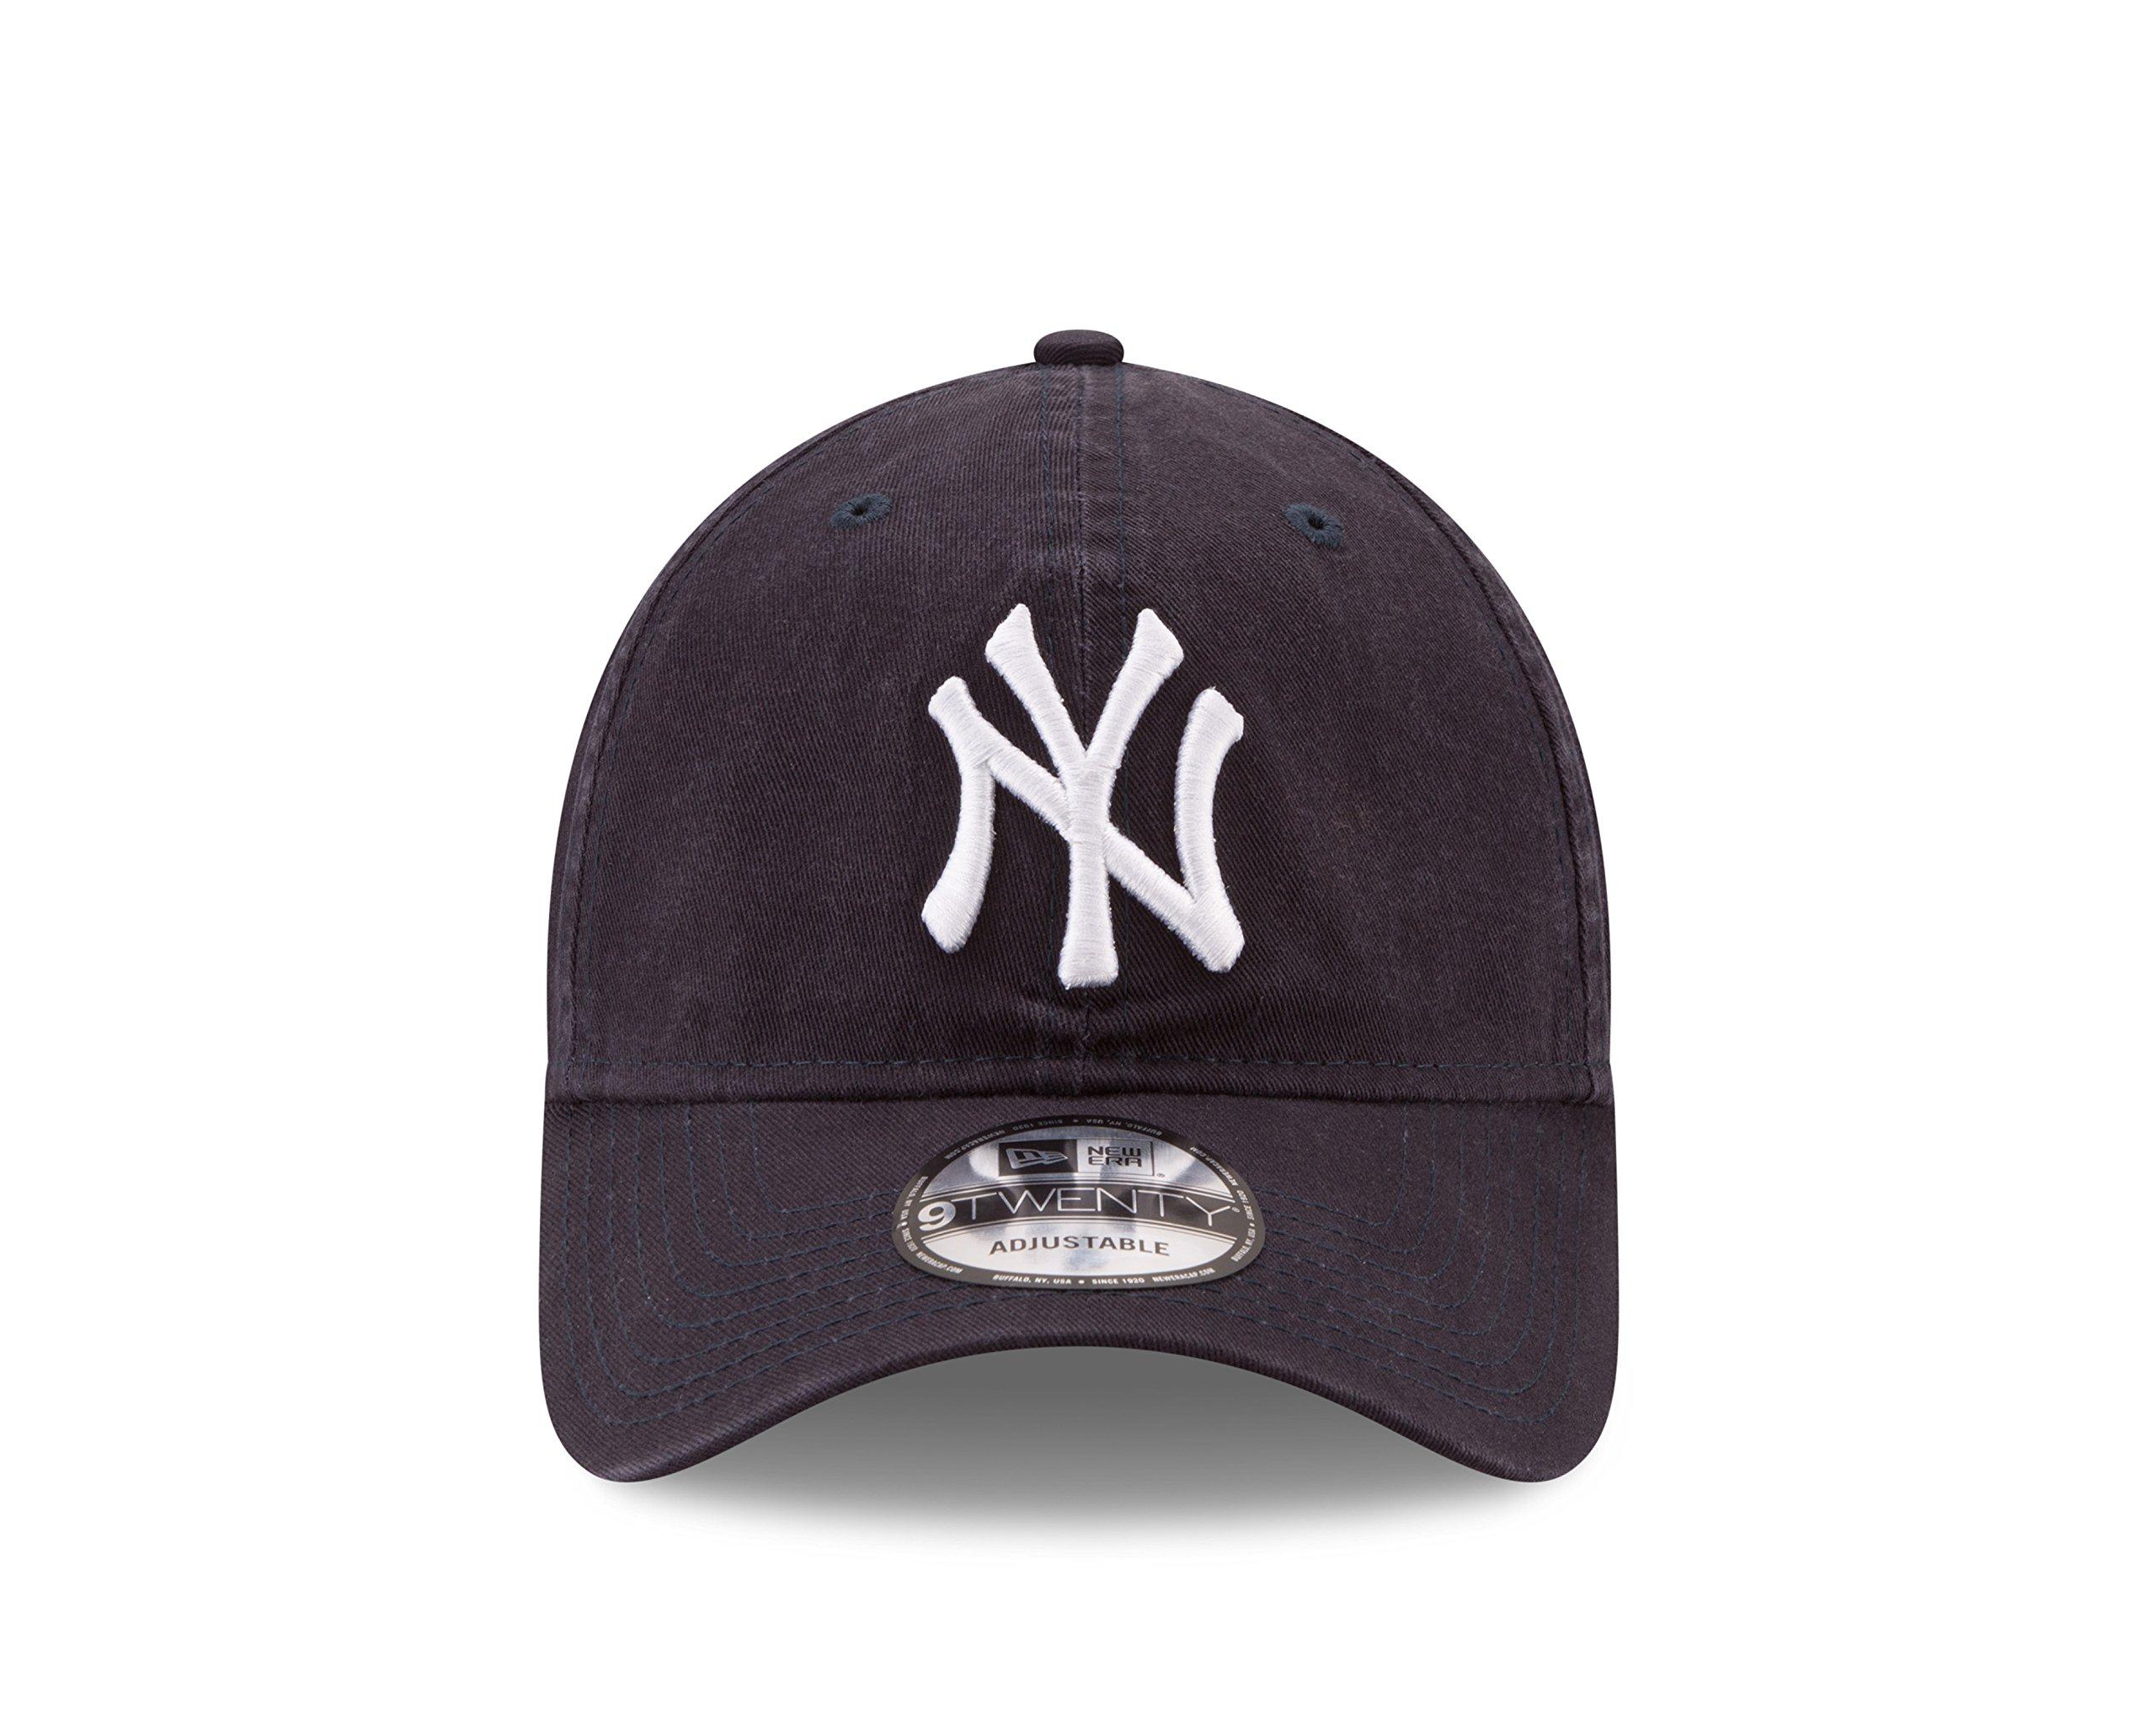 New Era New York Yankees MLB Core Classic 9TWENTY Adjustable Cap Navy by New Era (Image #3)